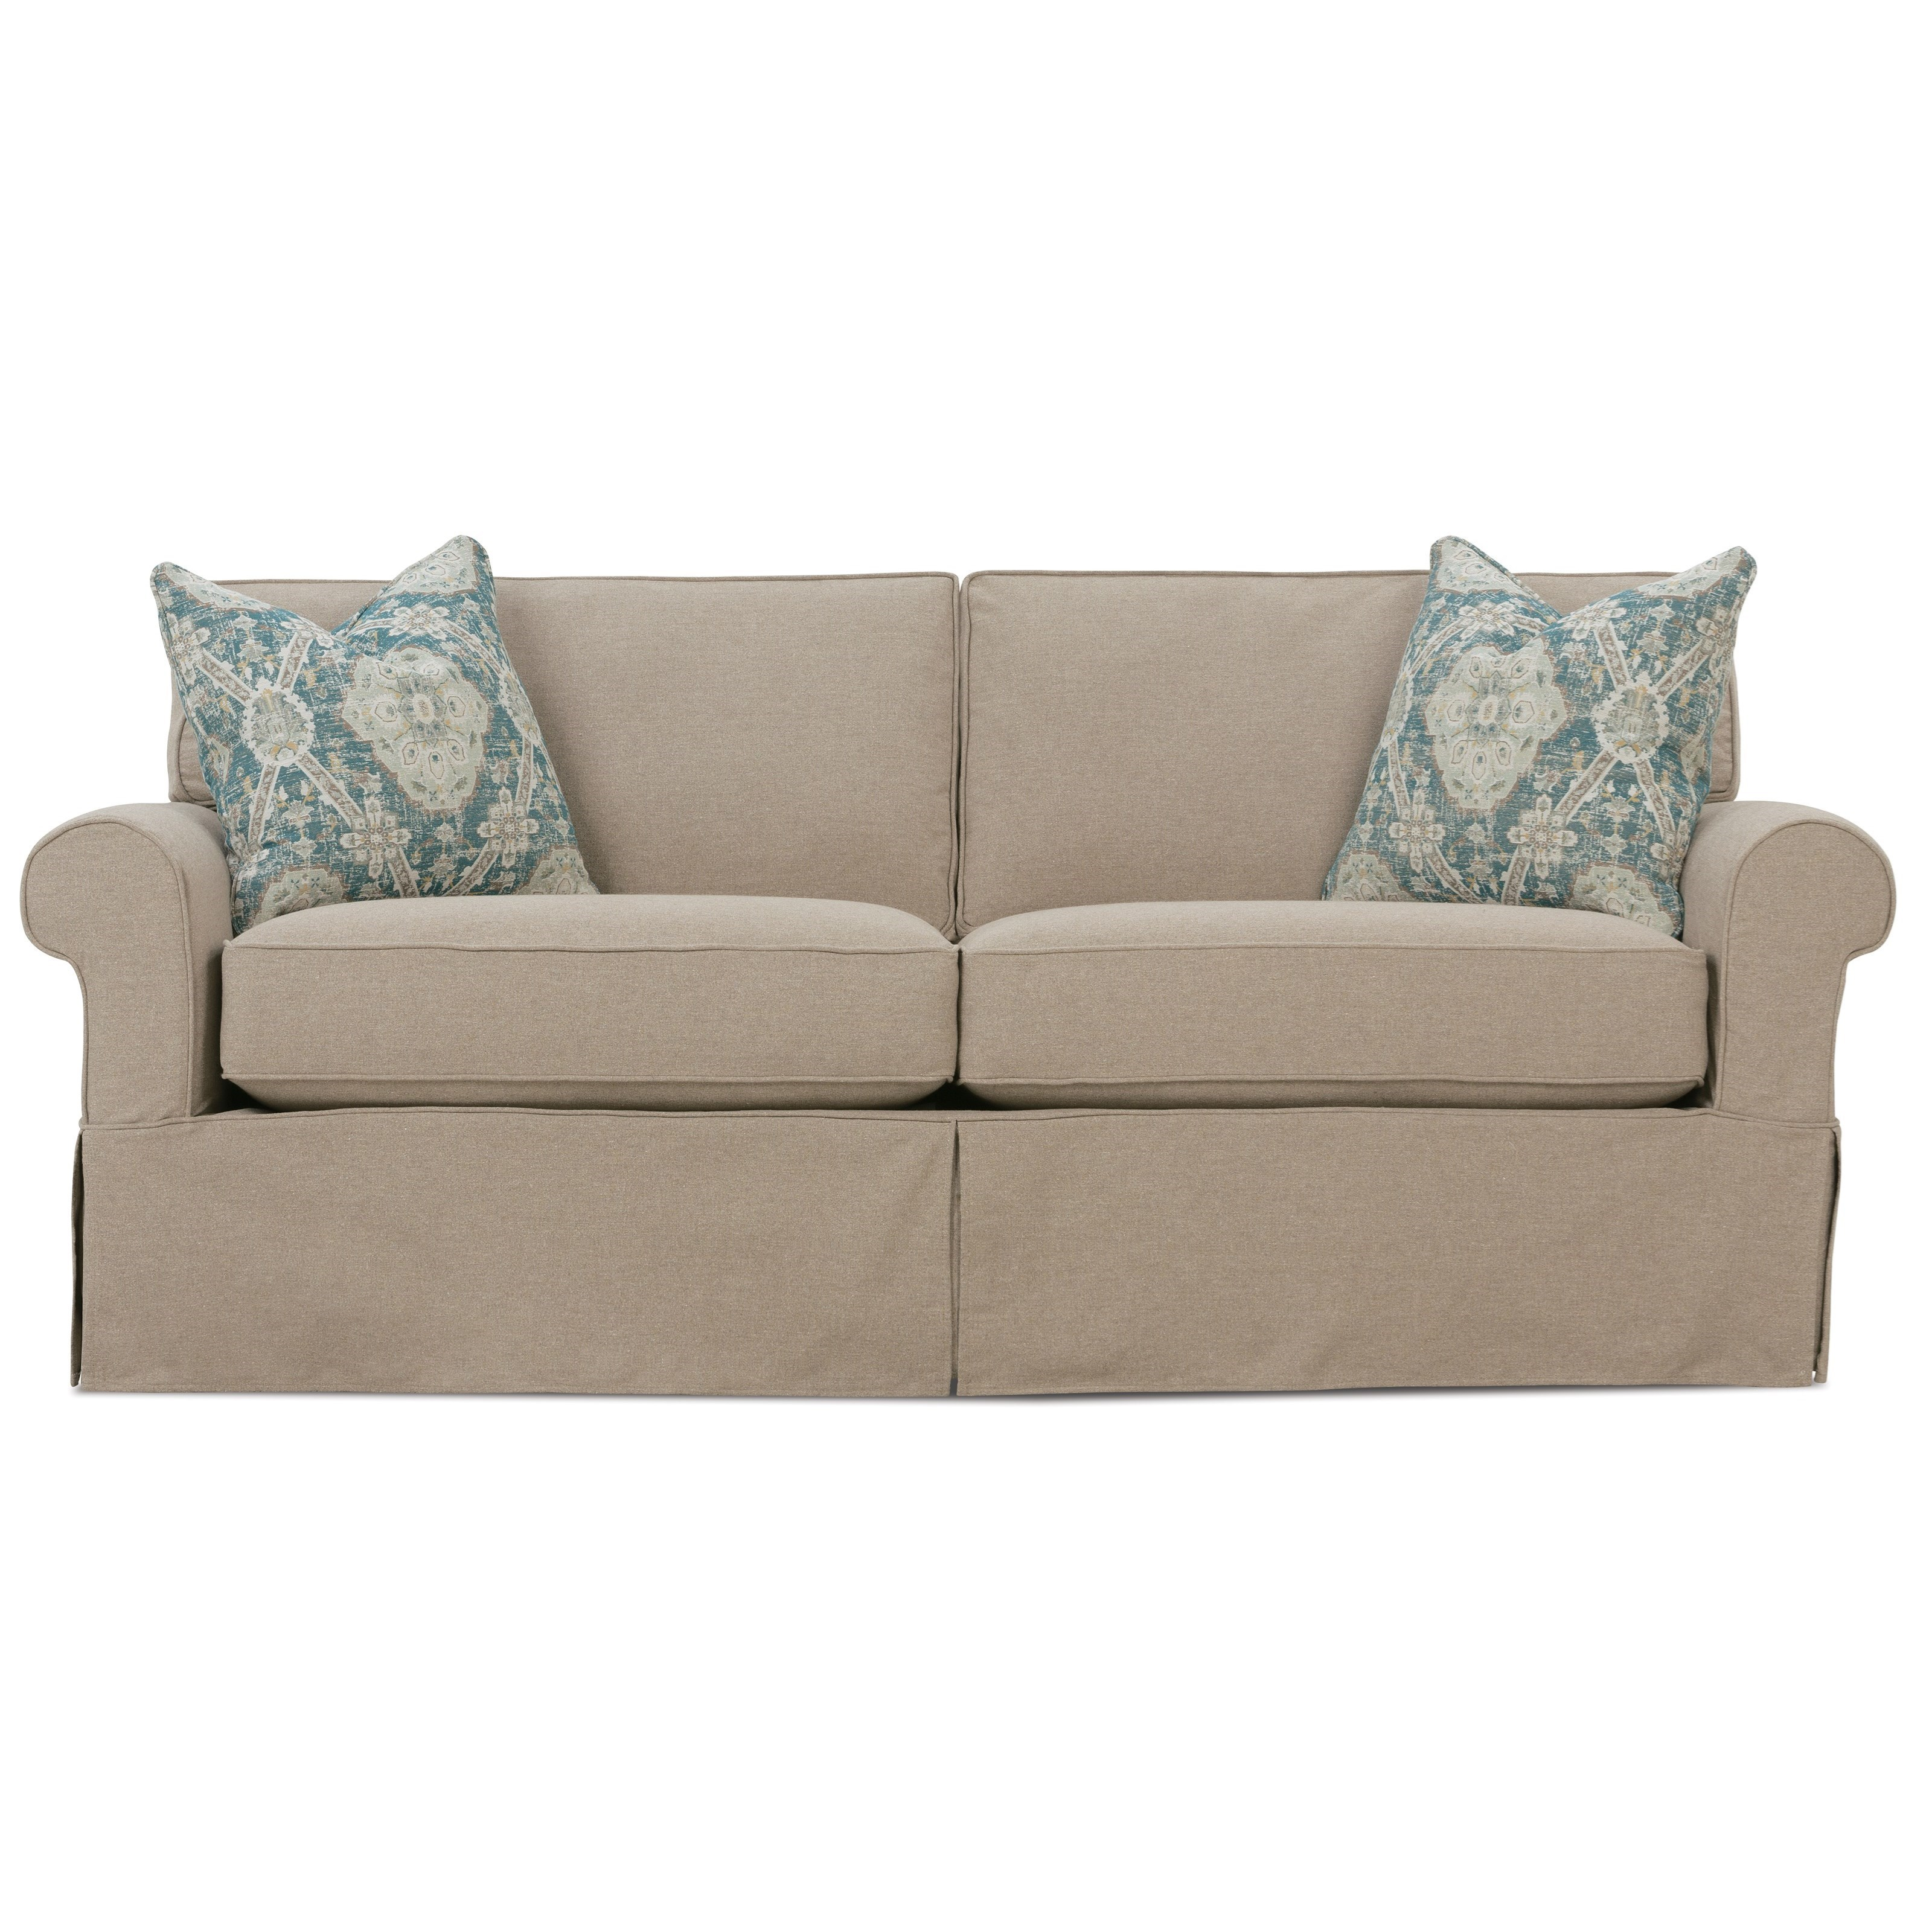 Nantucket  Casual 2-Seat Sofa by Rowe at Saugerties Furniture Mart